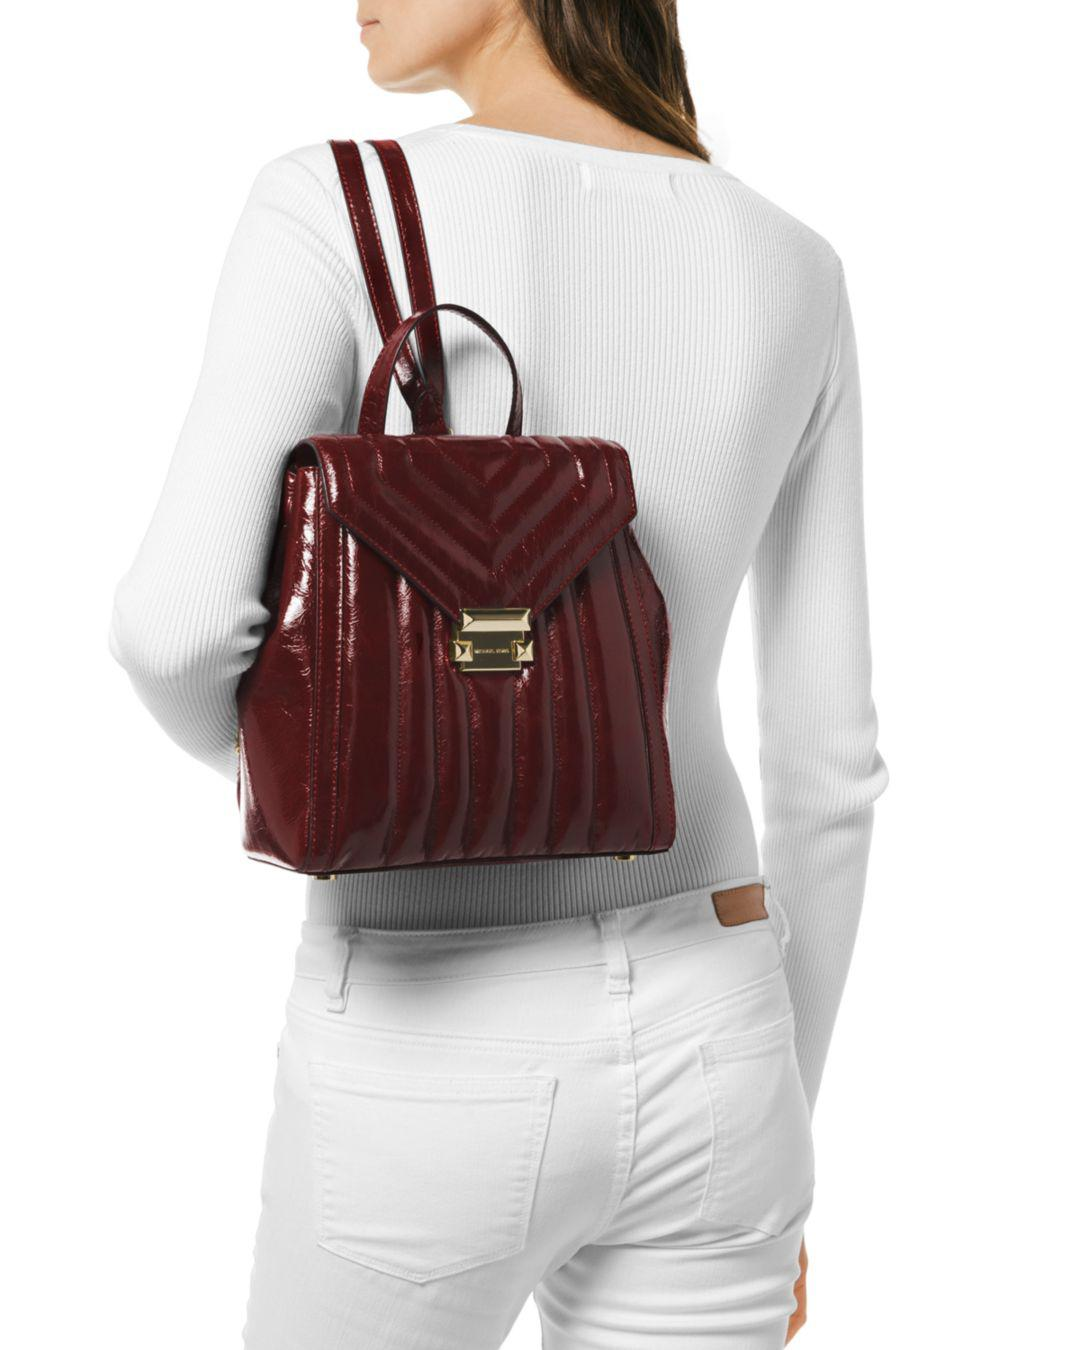 bc4c1088edd037 MICHAEL Michael Kors Whitney Medium Leather Backpack in Red - Lyst